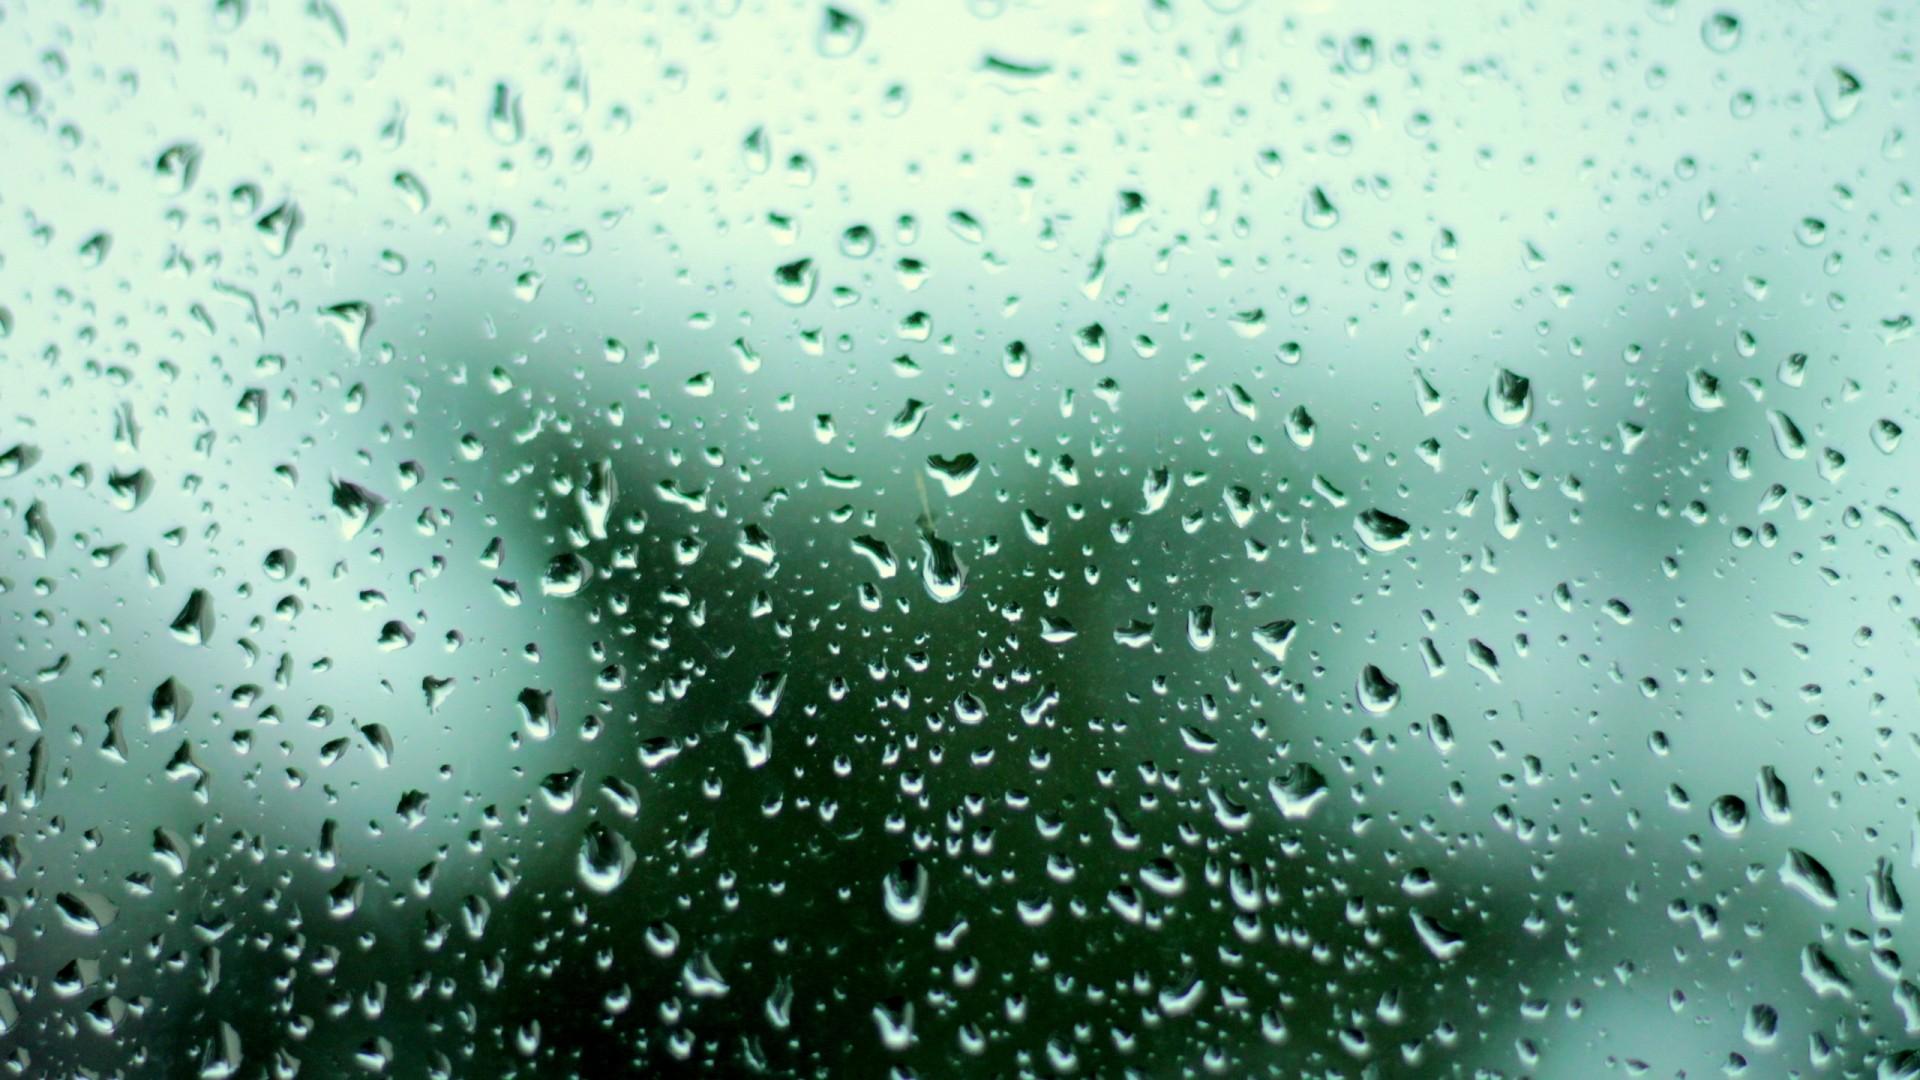 Spring Rain Desktop Wallpaper | Wide Screen Wallpaper ...